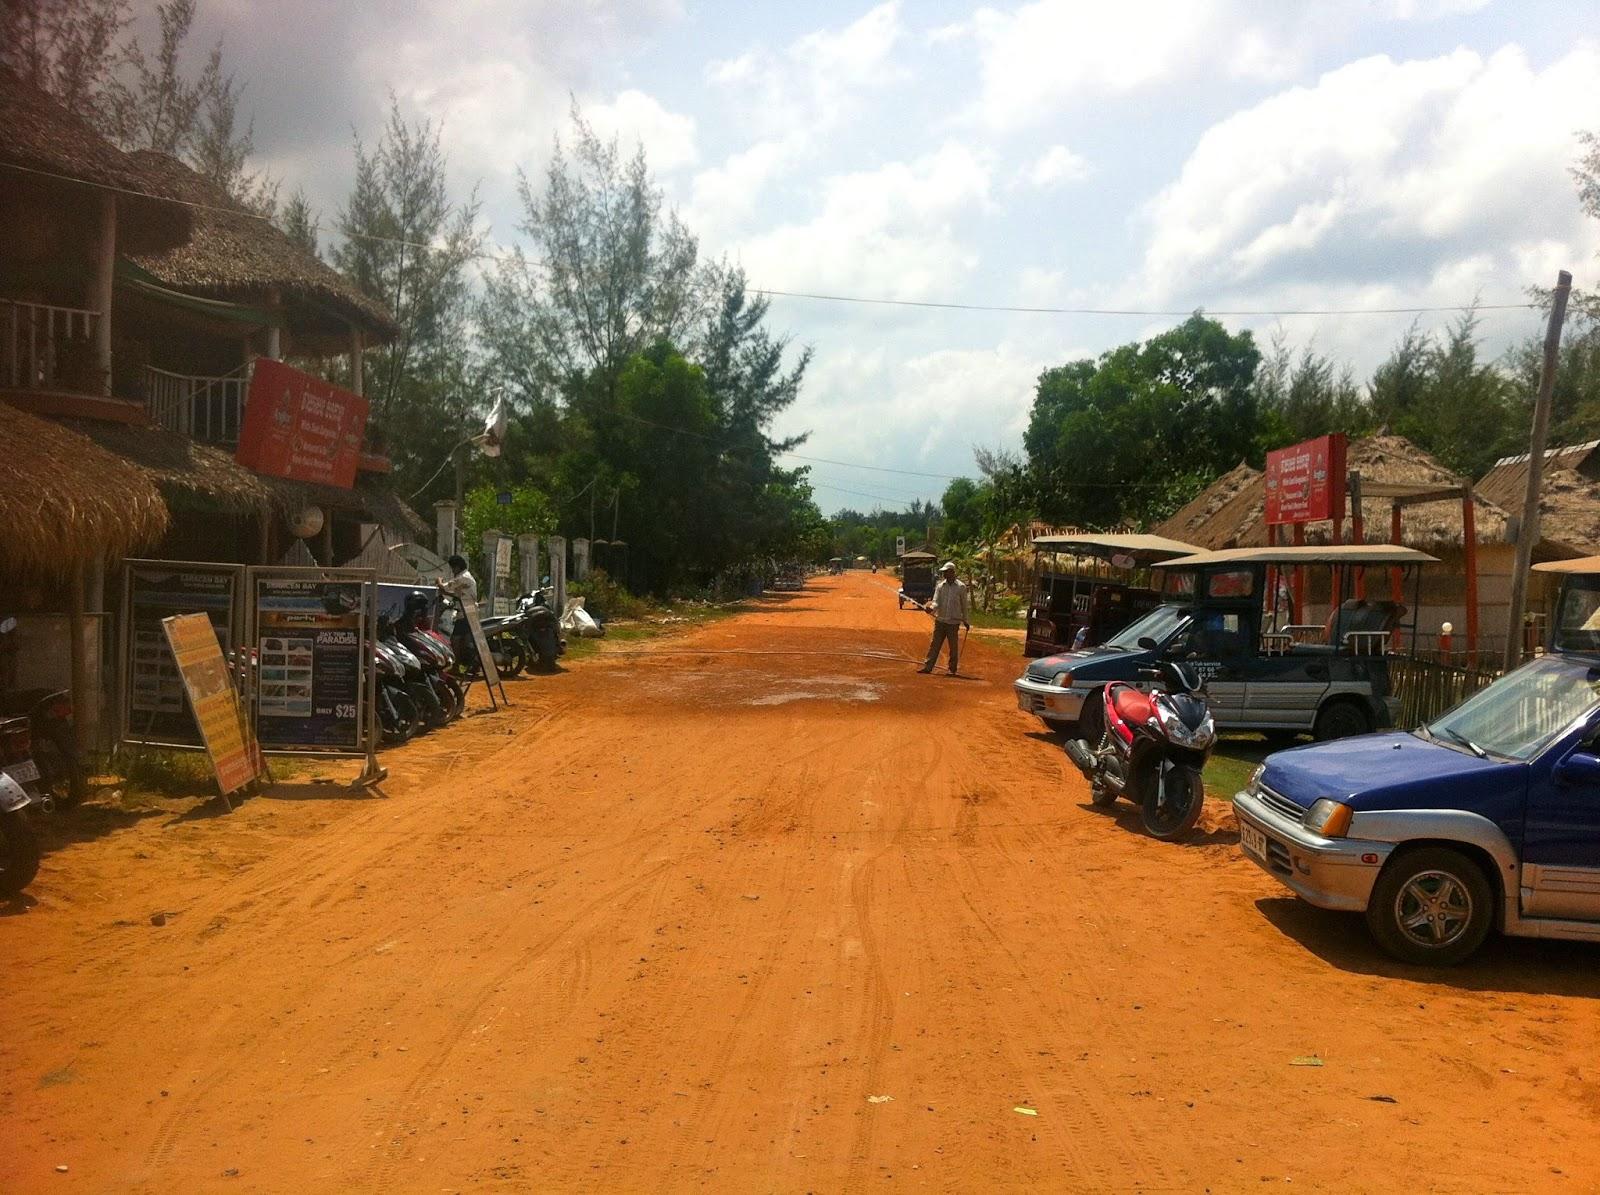 Otres Beach II, Sihanoukville, Cambodia, Southeast Asia